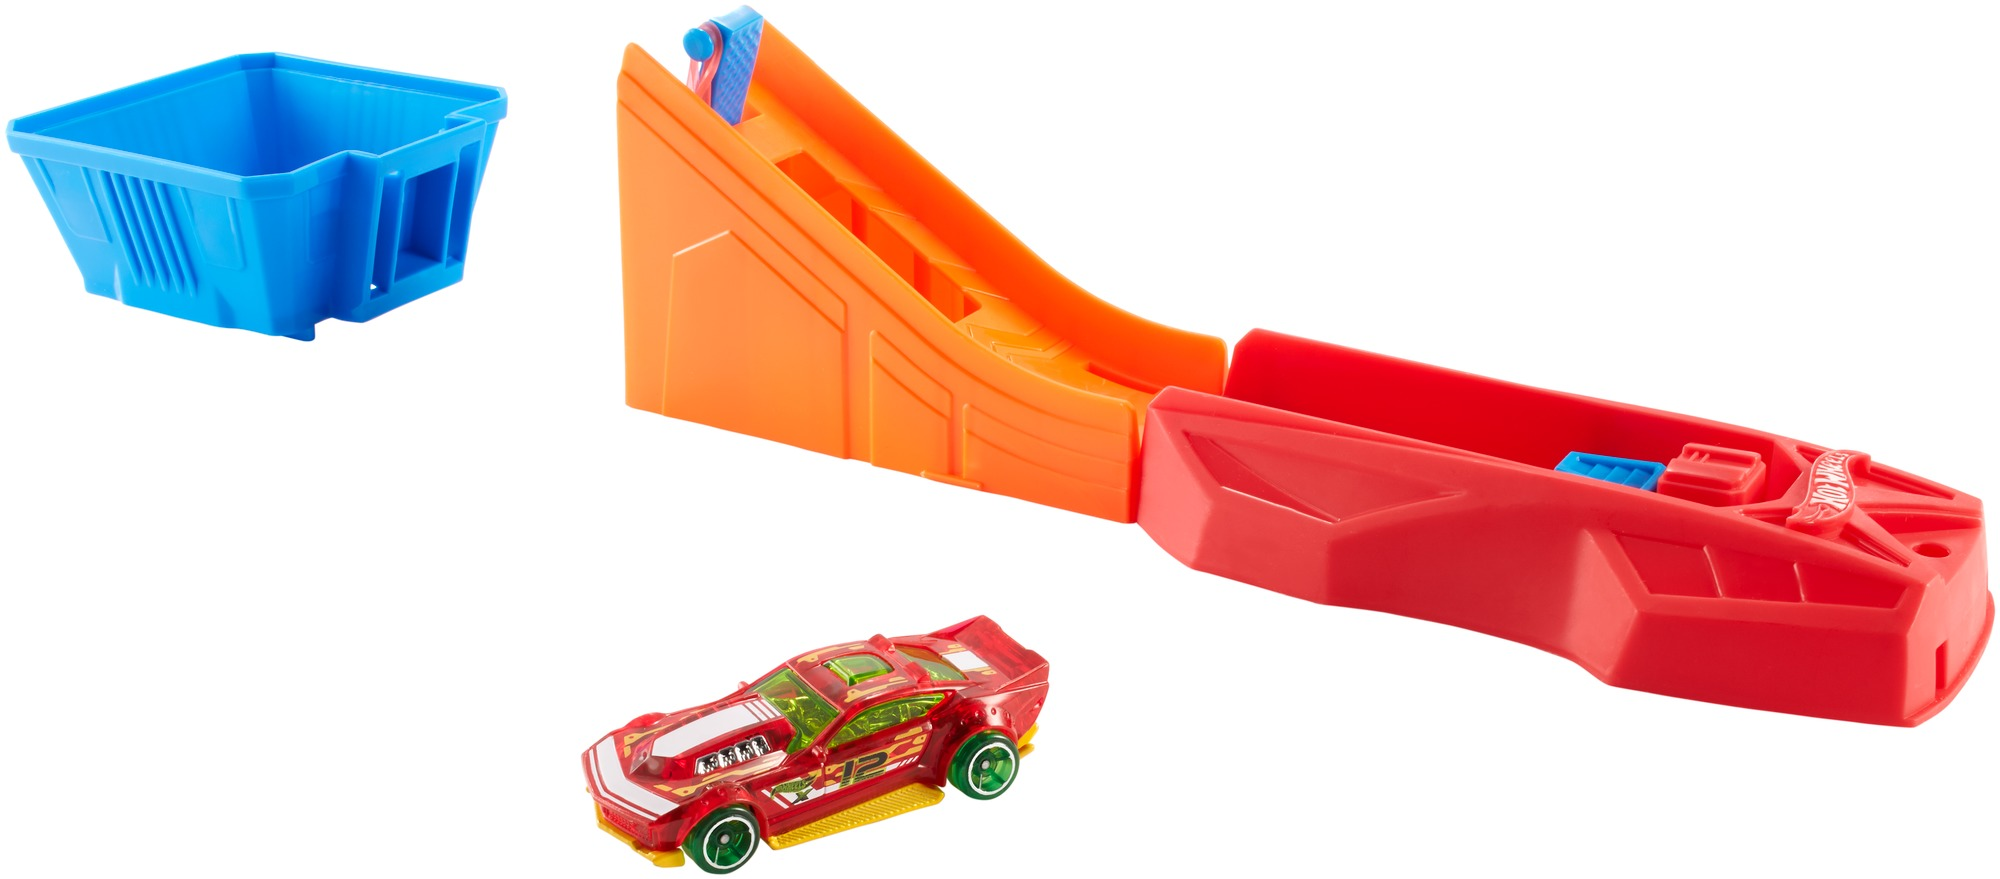 Hot wheels veicoli per acrobazie assortiti, macchinine per bambini - Hot Wheels